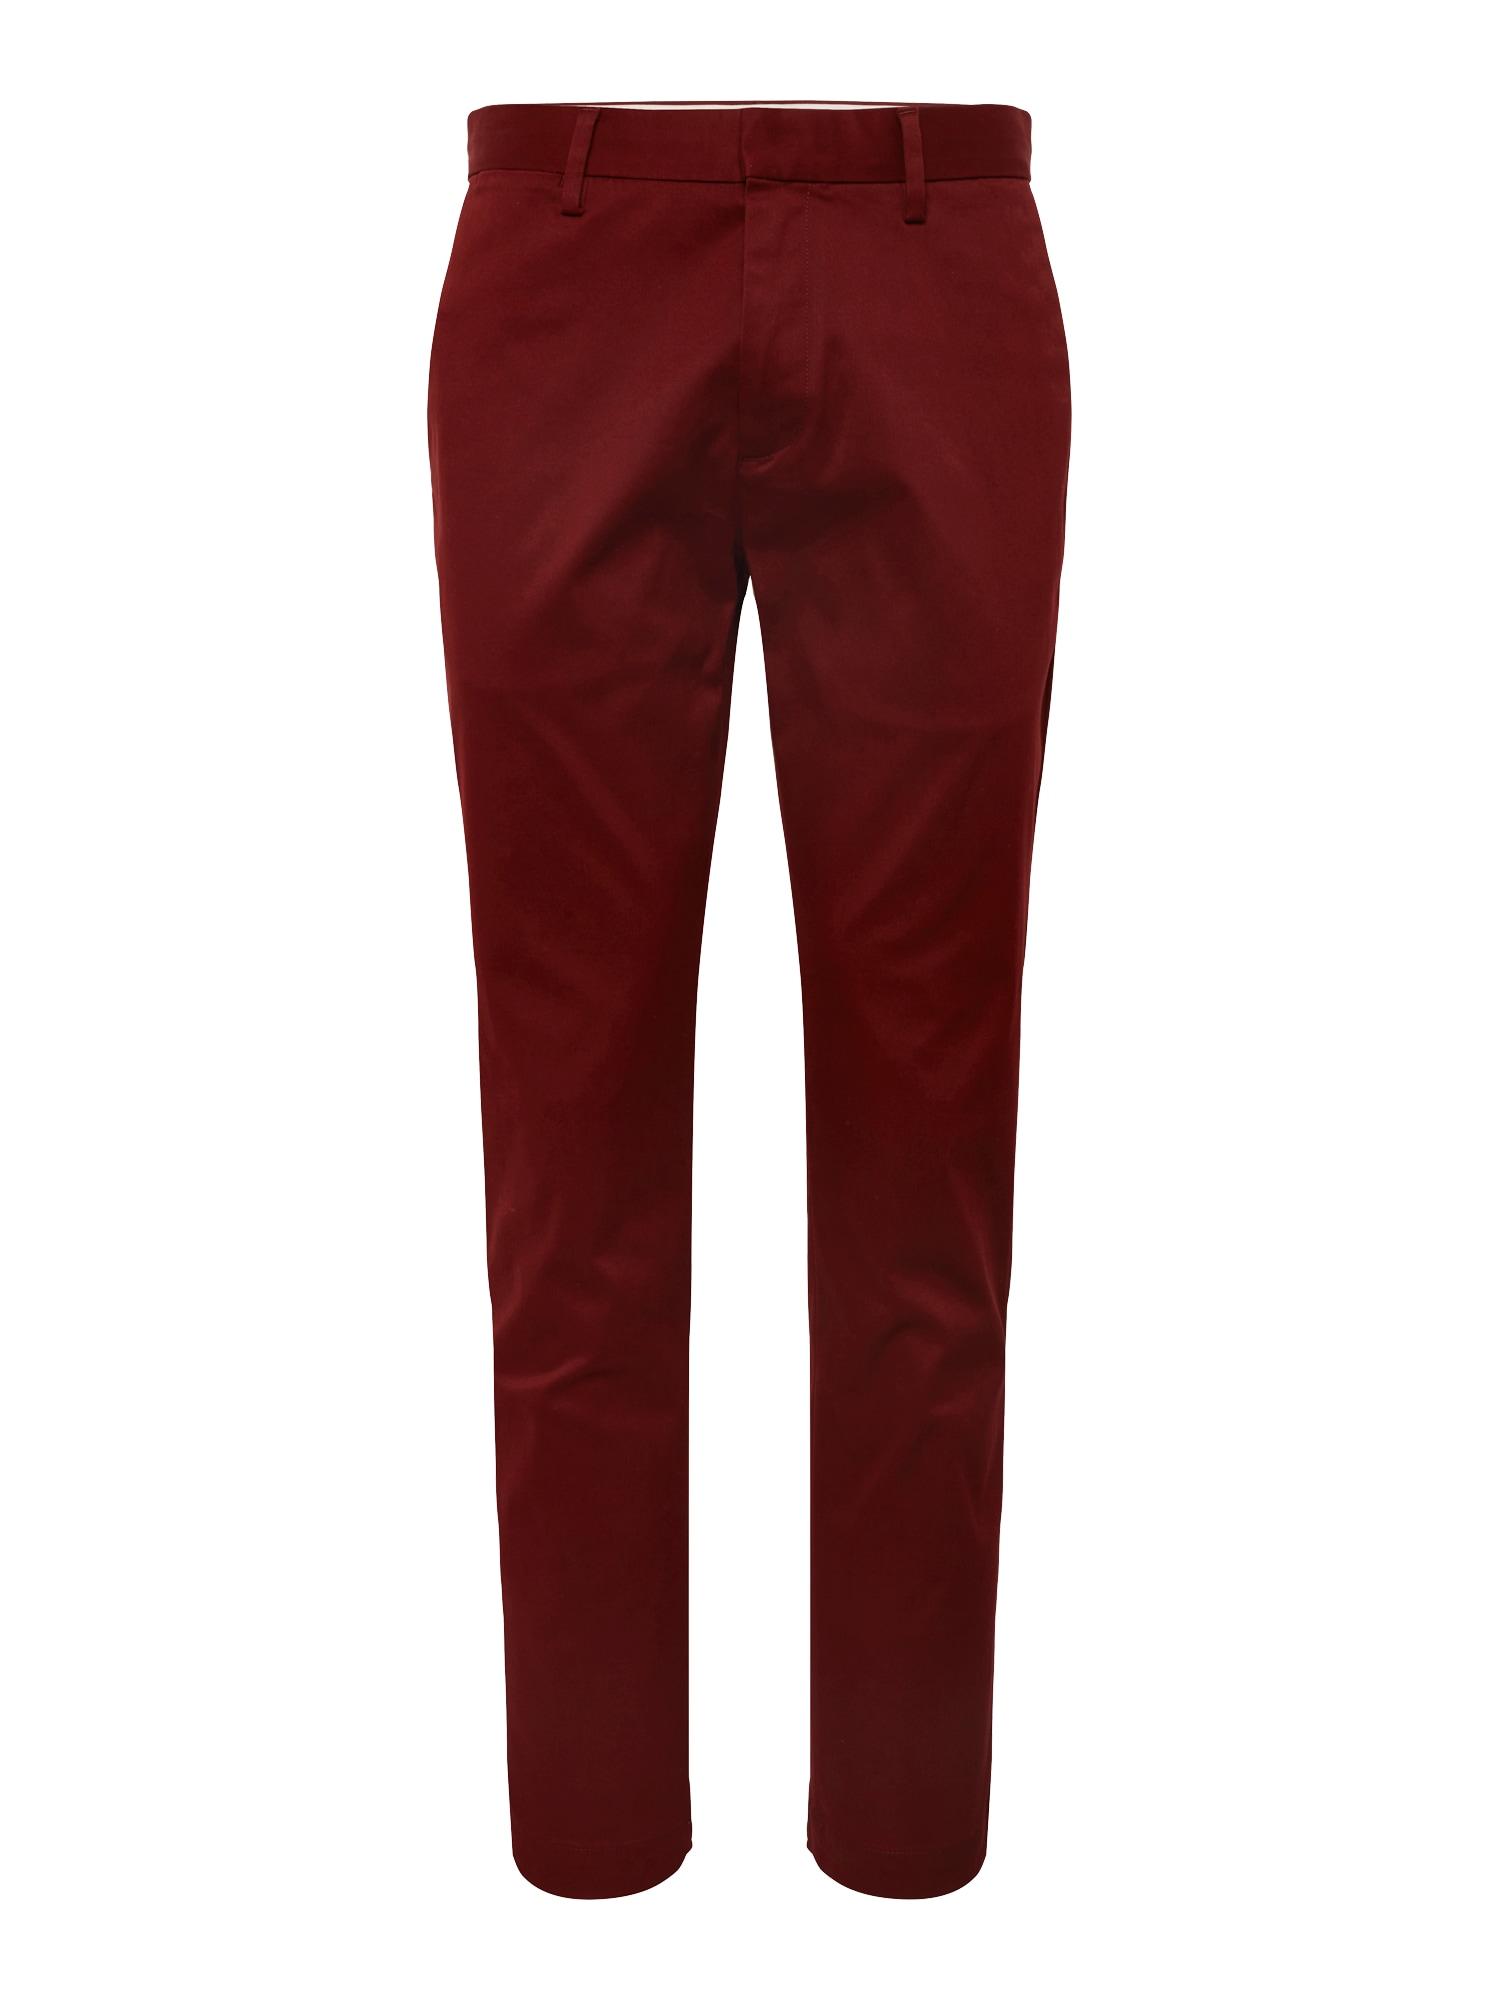 Chino kalhoty AIDEN RMC červená Banana Republic